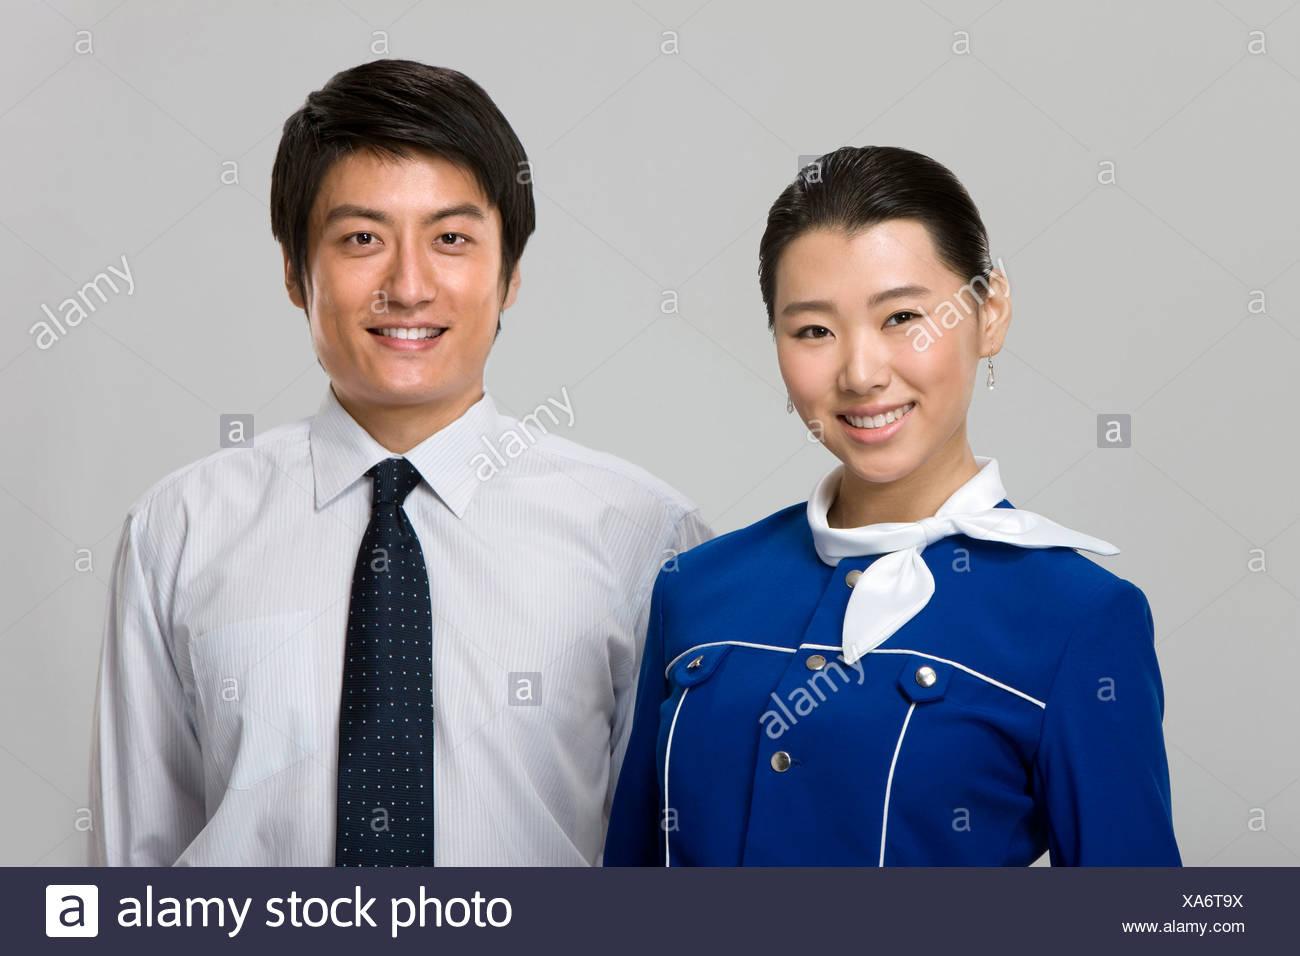 Smiling Flight Attendant - Stock Image